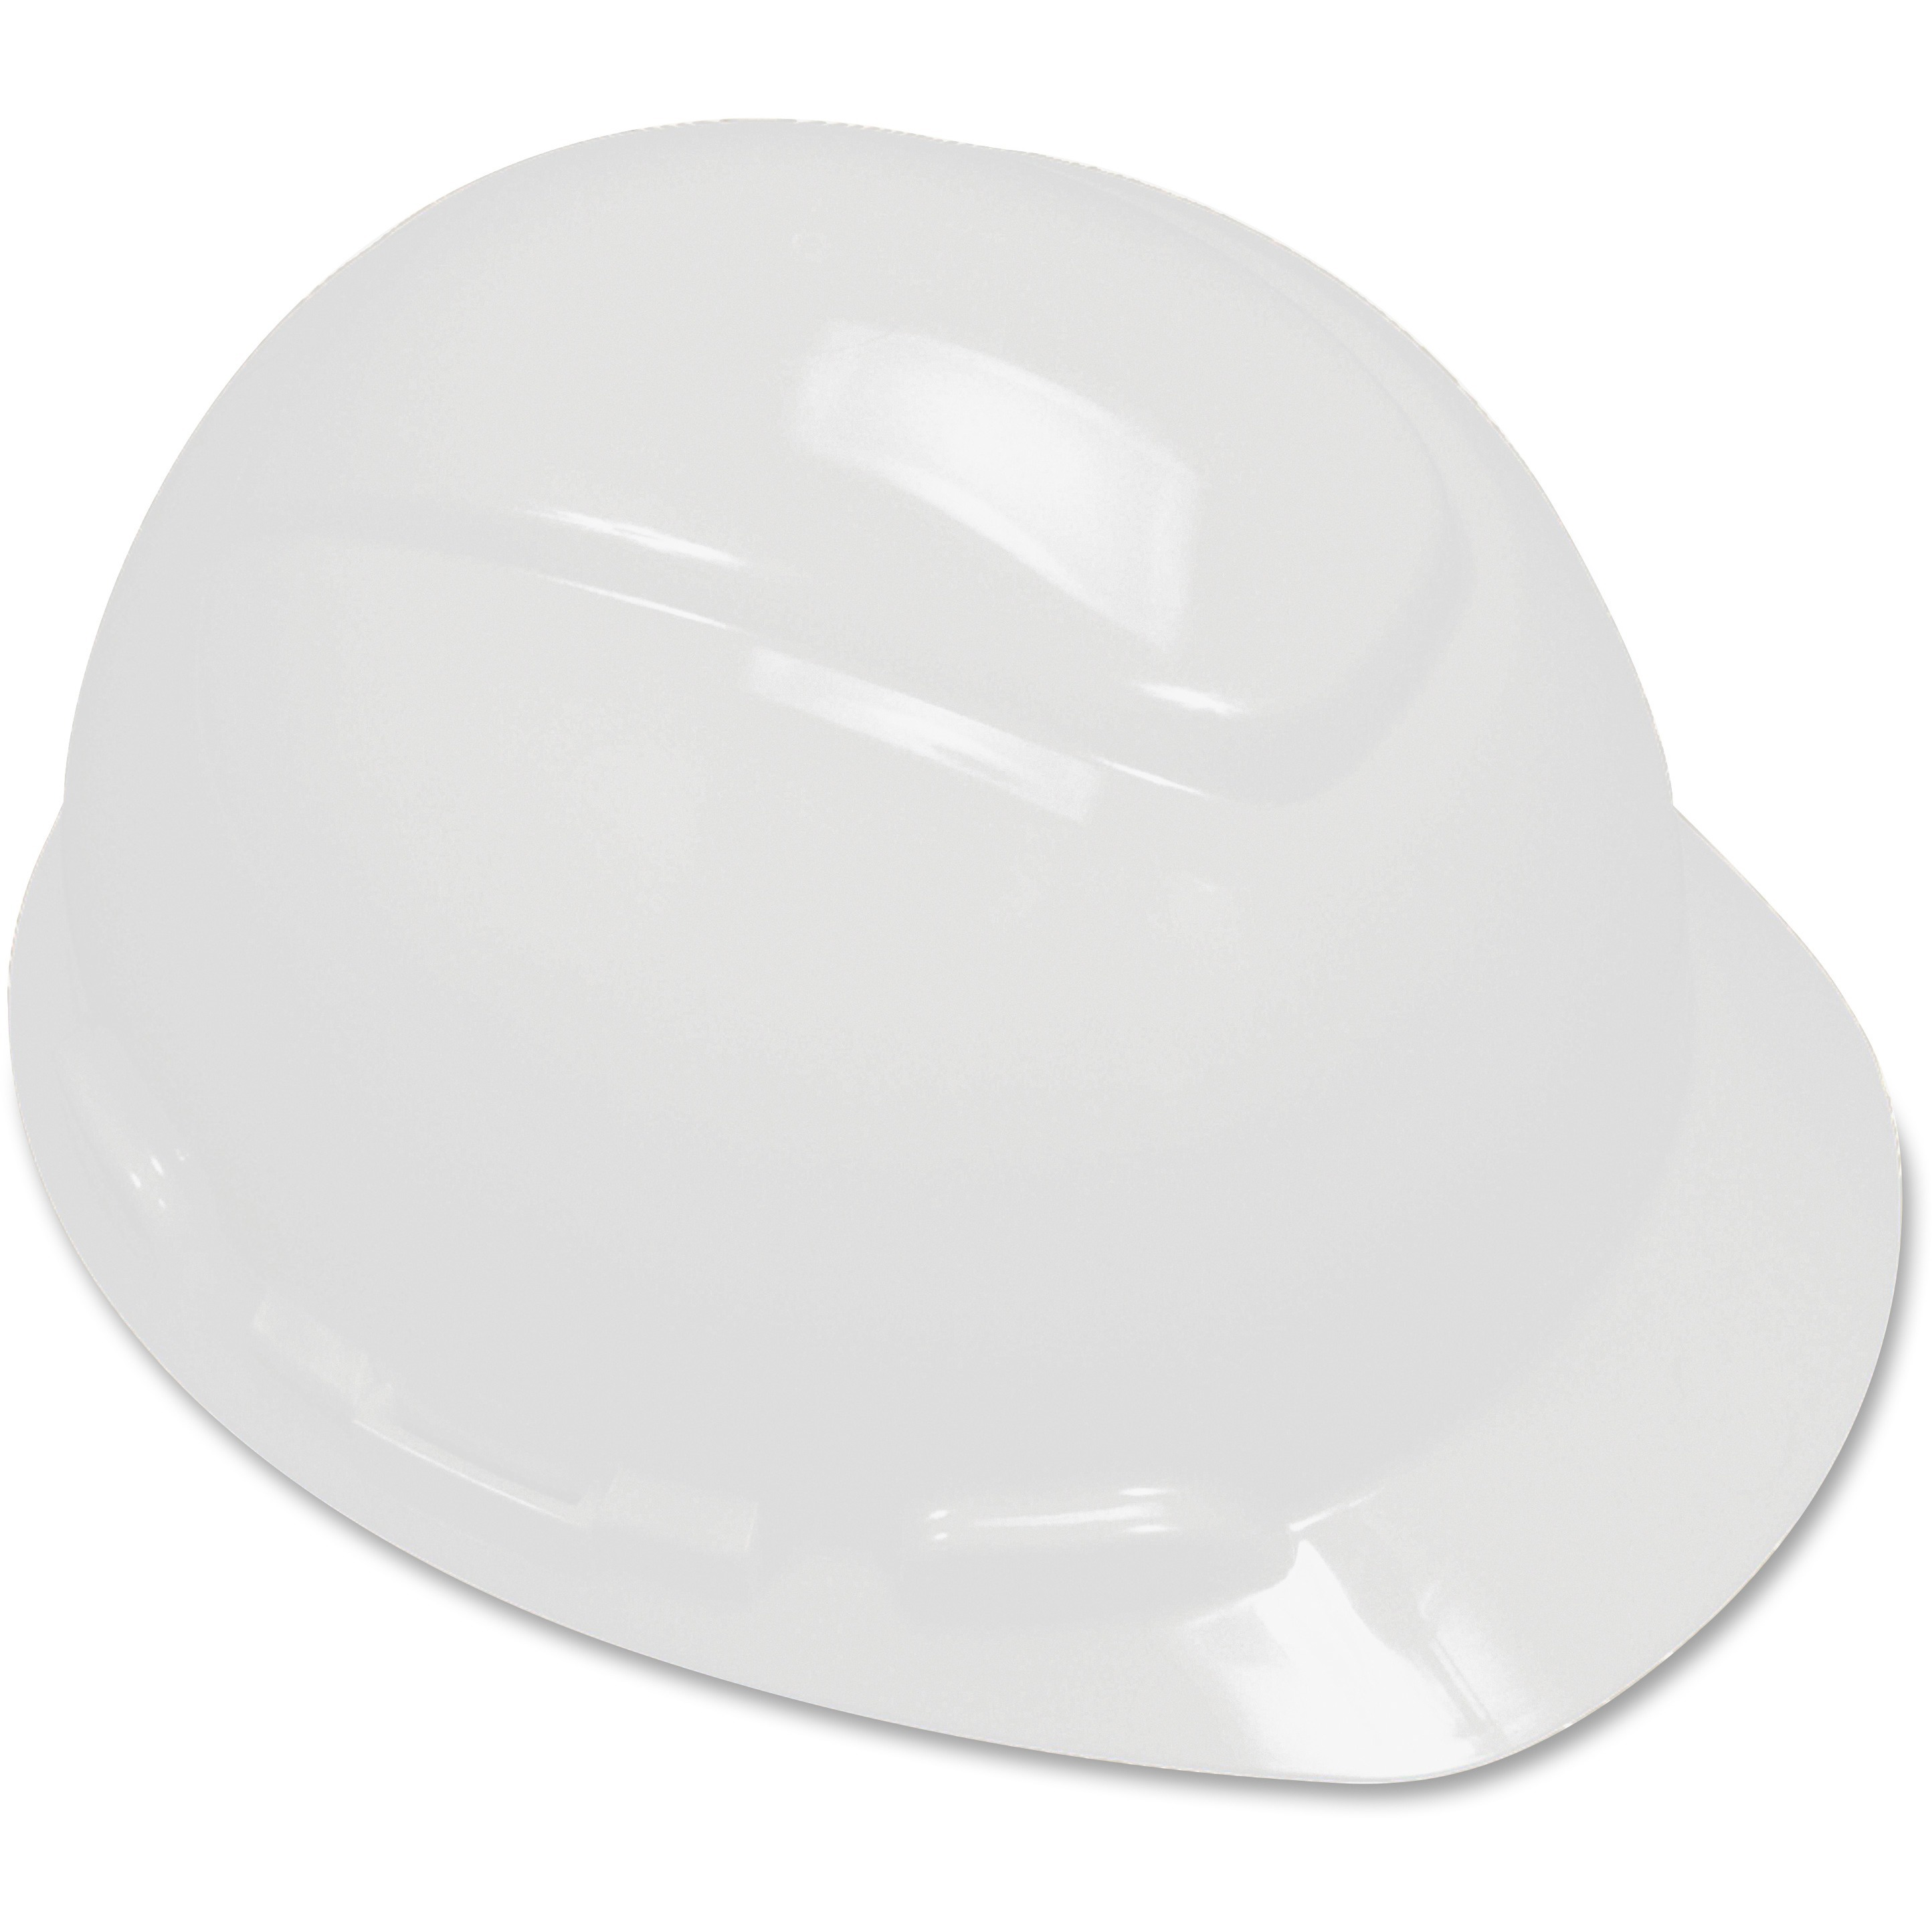 3M, MMMH701R, H700 Series Ratchet Suspension Hard Hat, 1 / Each, White - Walmart.com